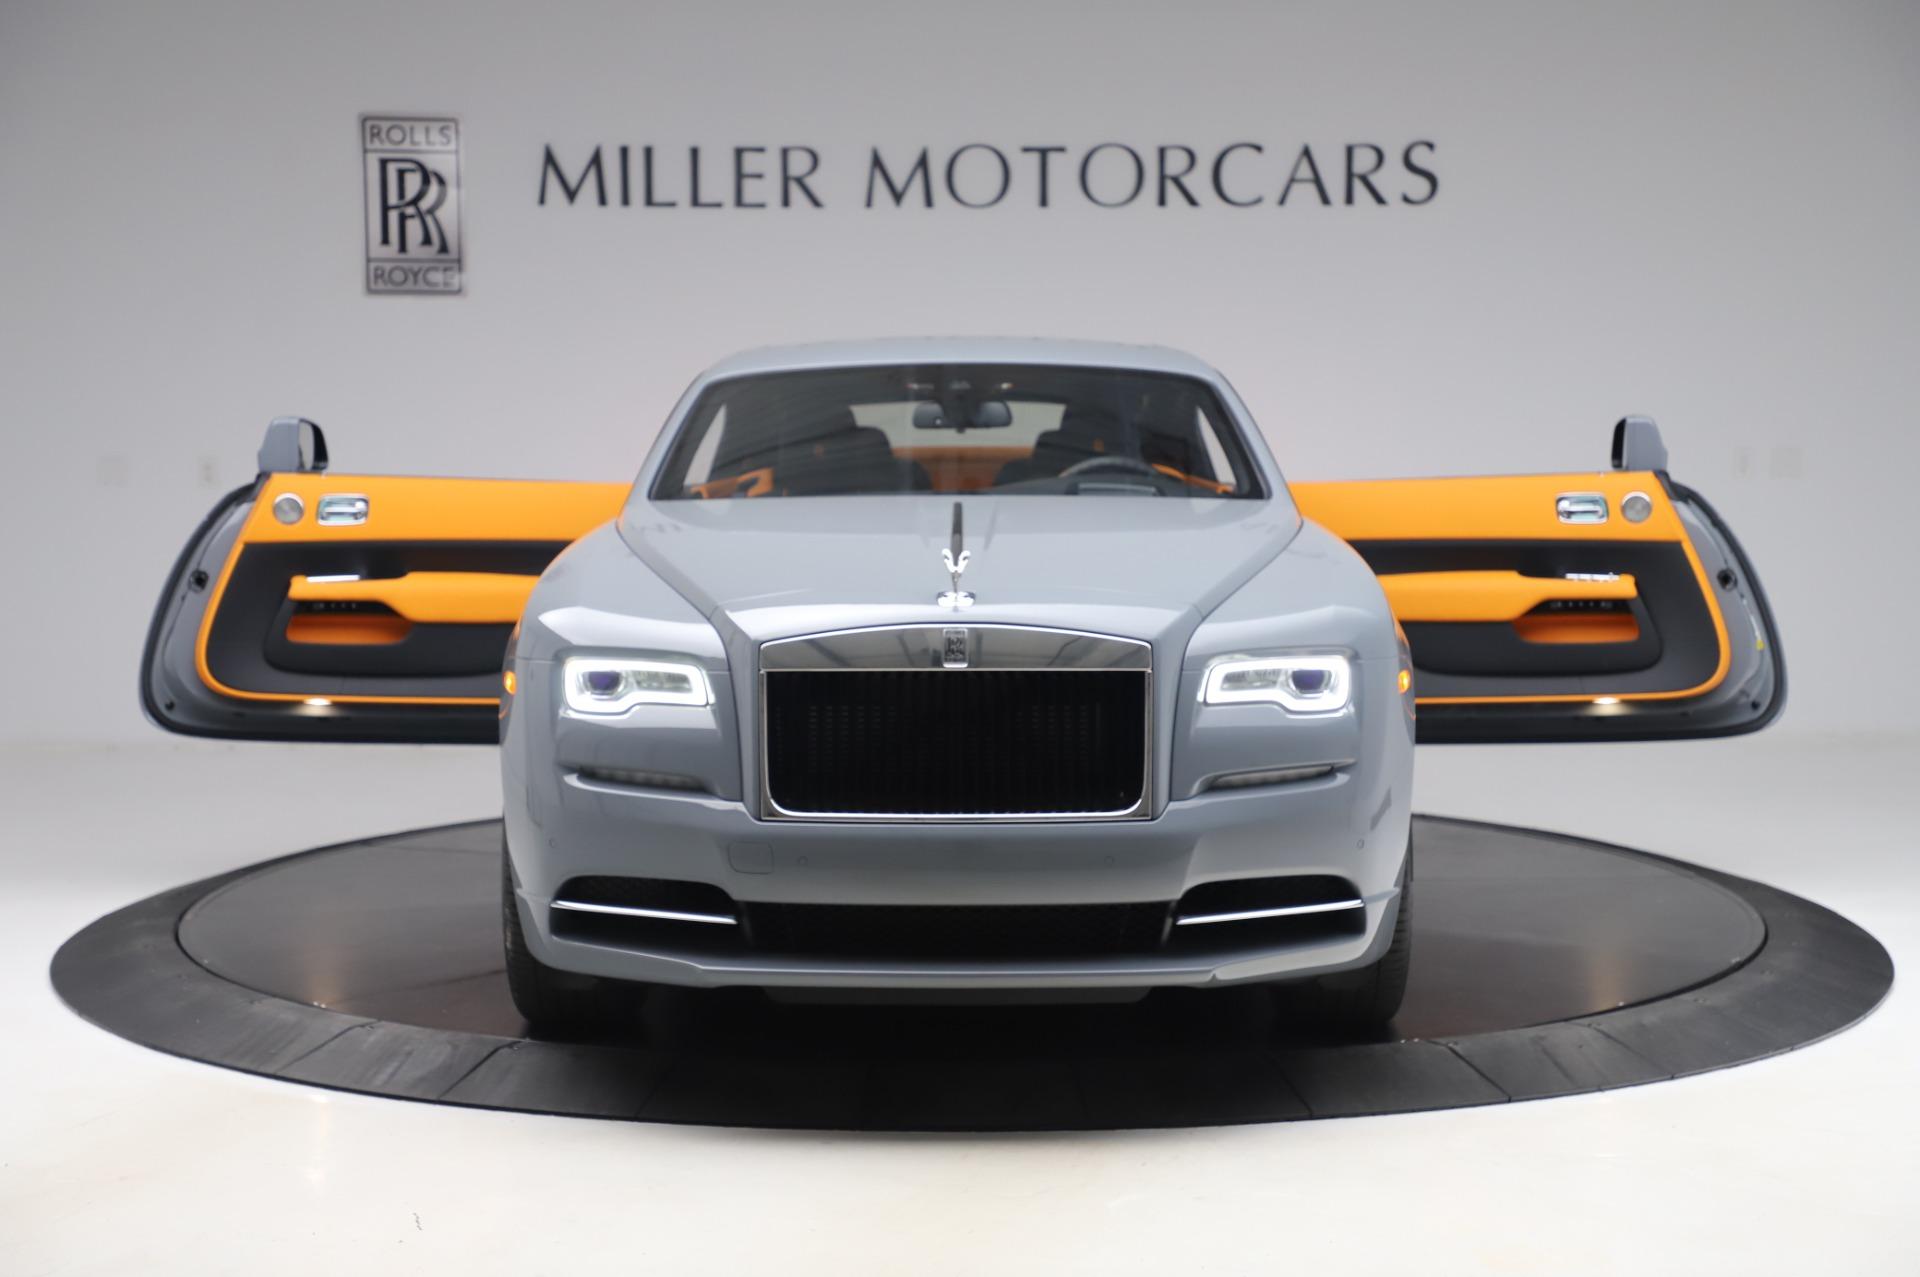 Used 2020 Rolls Royce Wraith